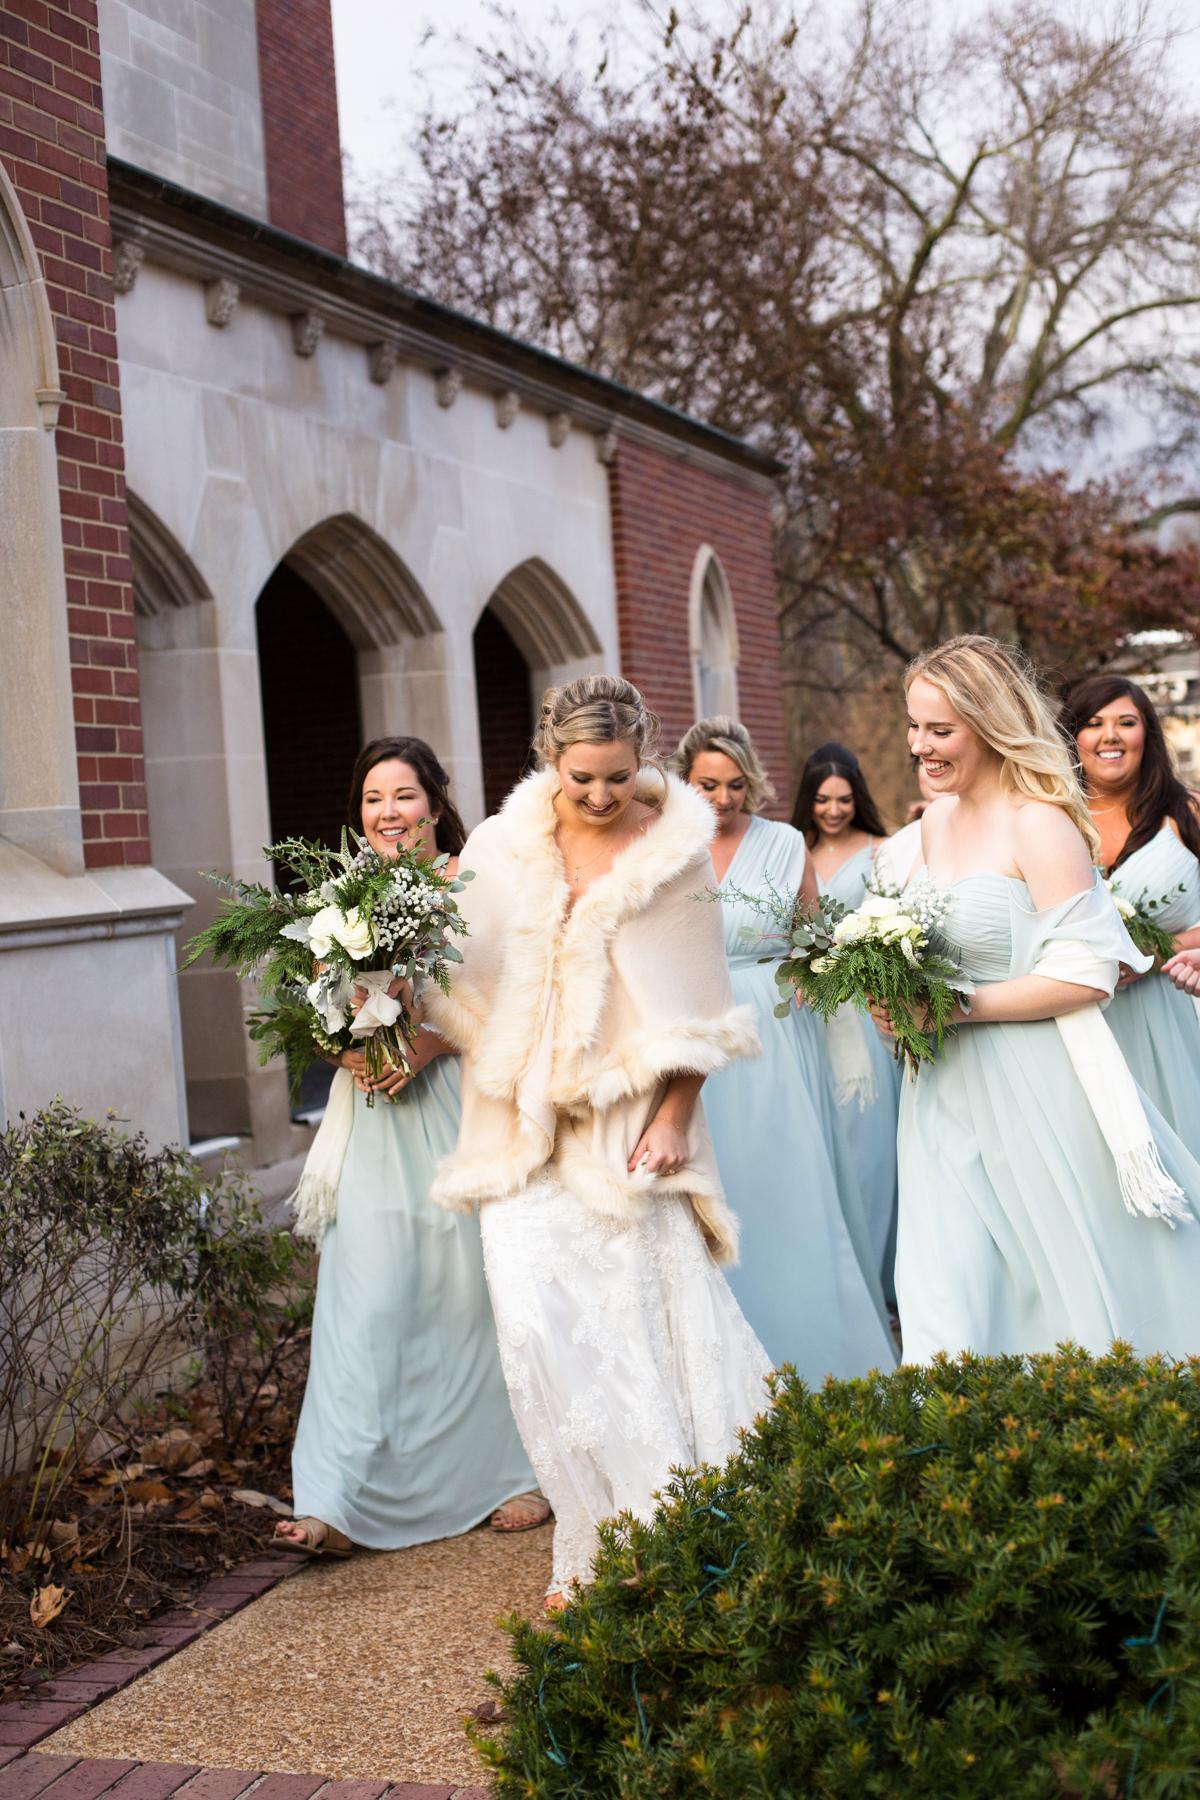 Kelli-and-Matt-Nashville-Wedding-Sneak-Peak-0169.jpg